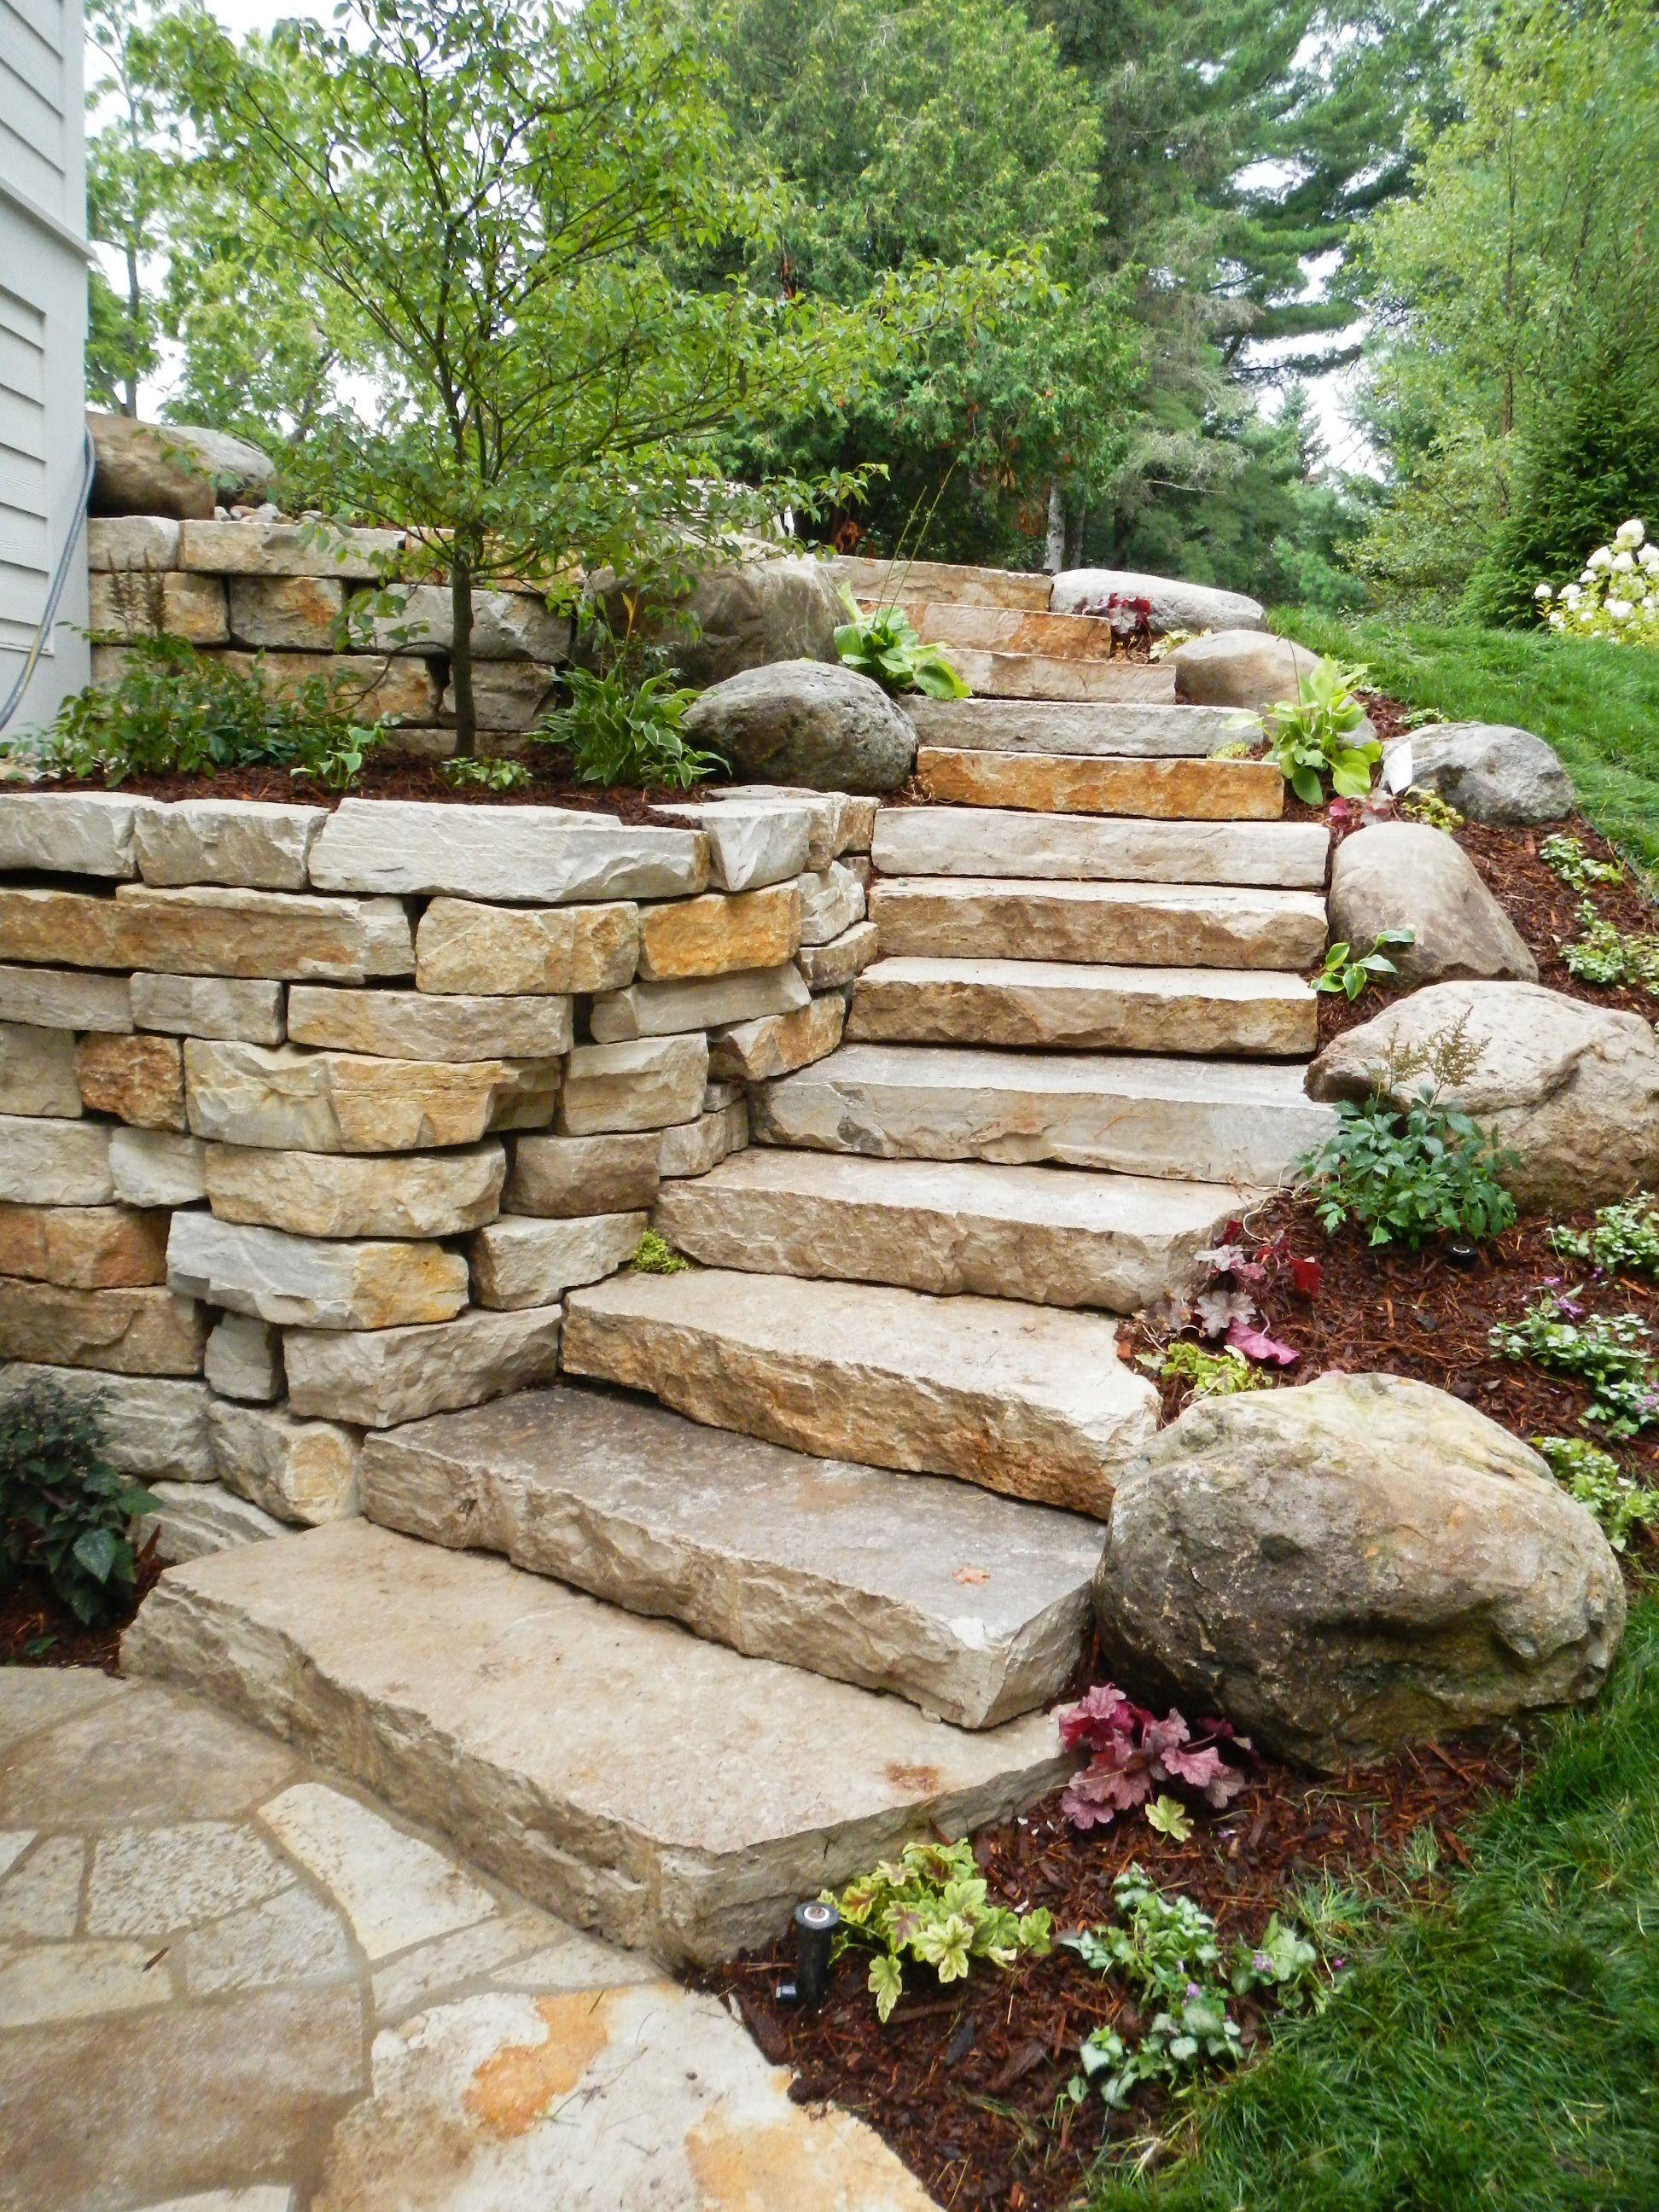 Fondulac Slabstone Backyard Landscaping Backyard Garden | Granite Stone Steps Outdoor